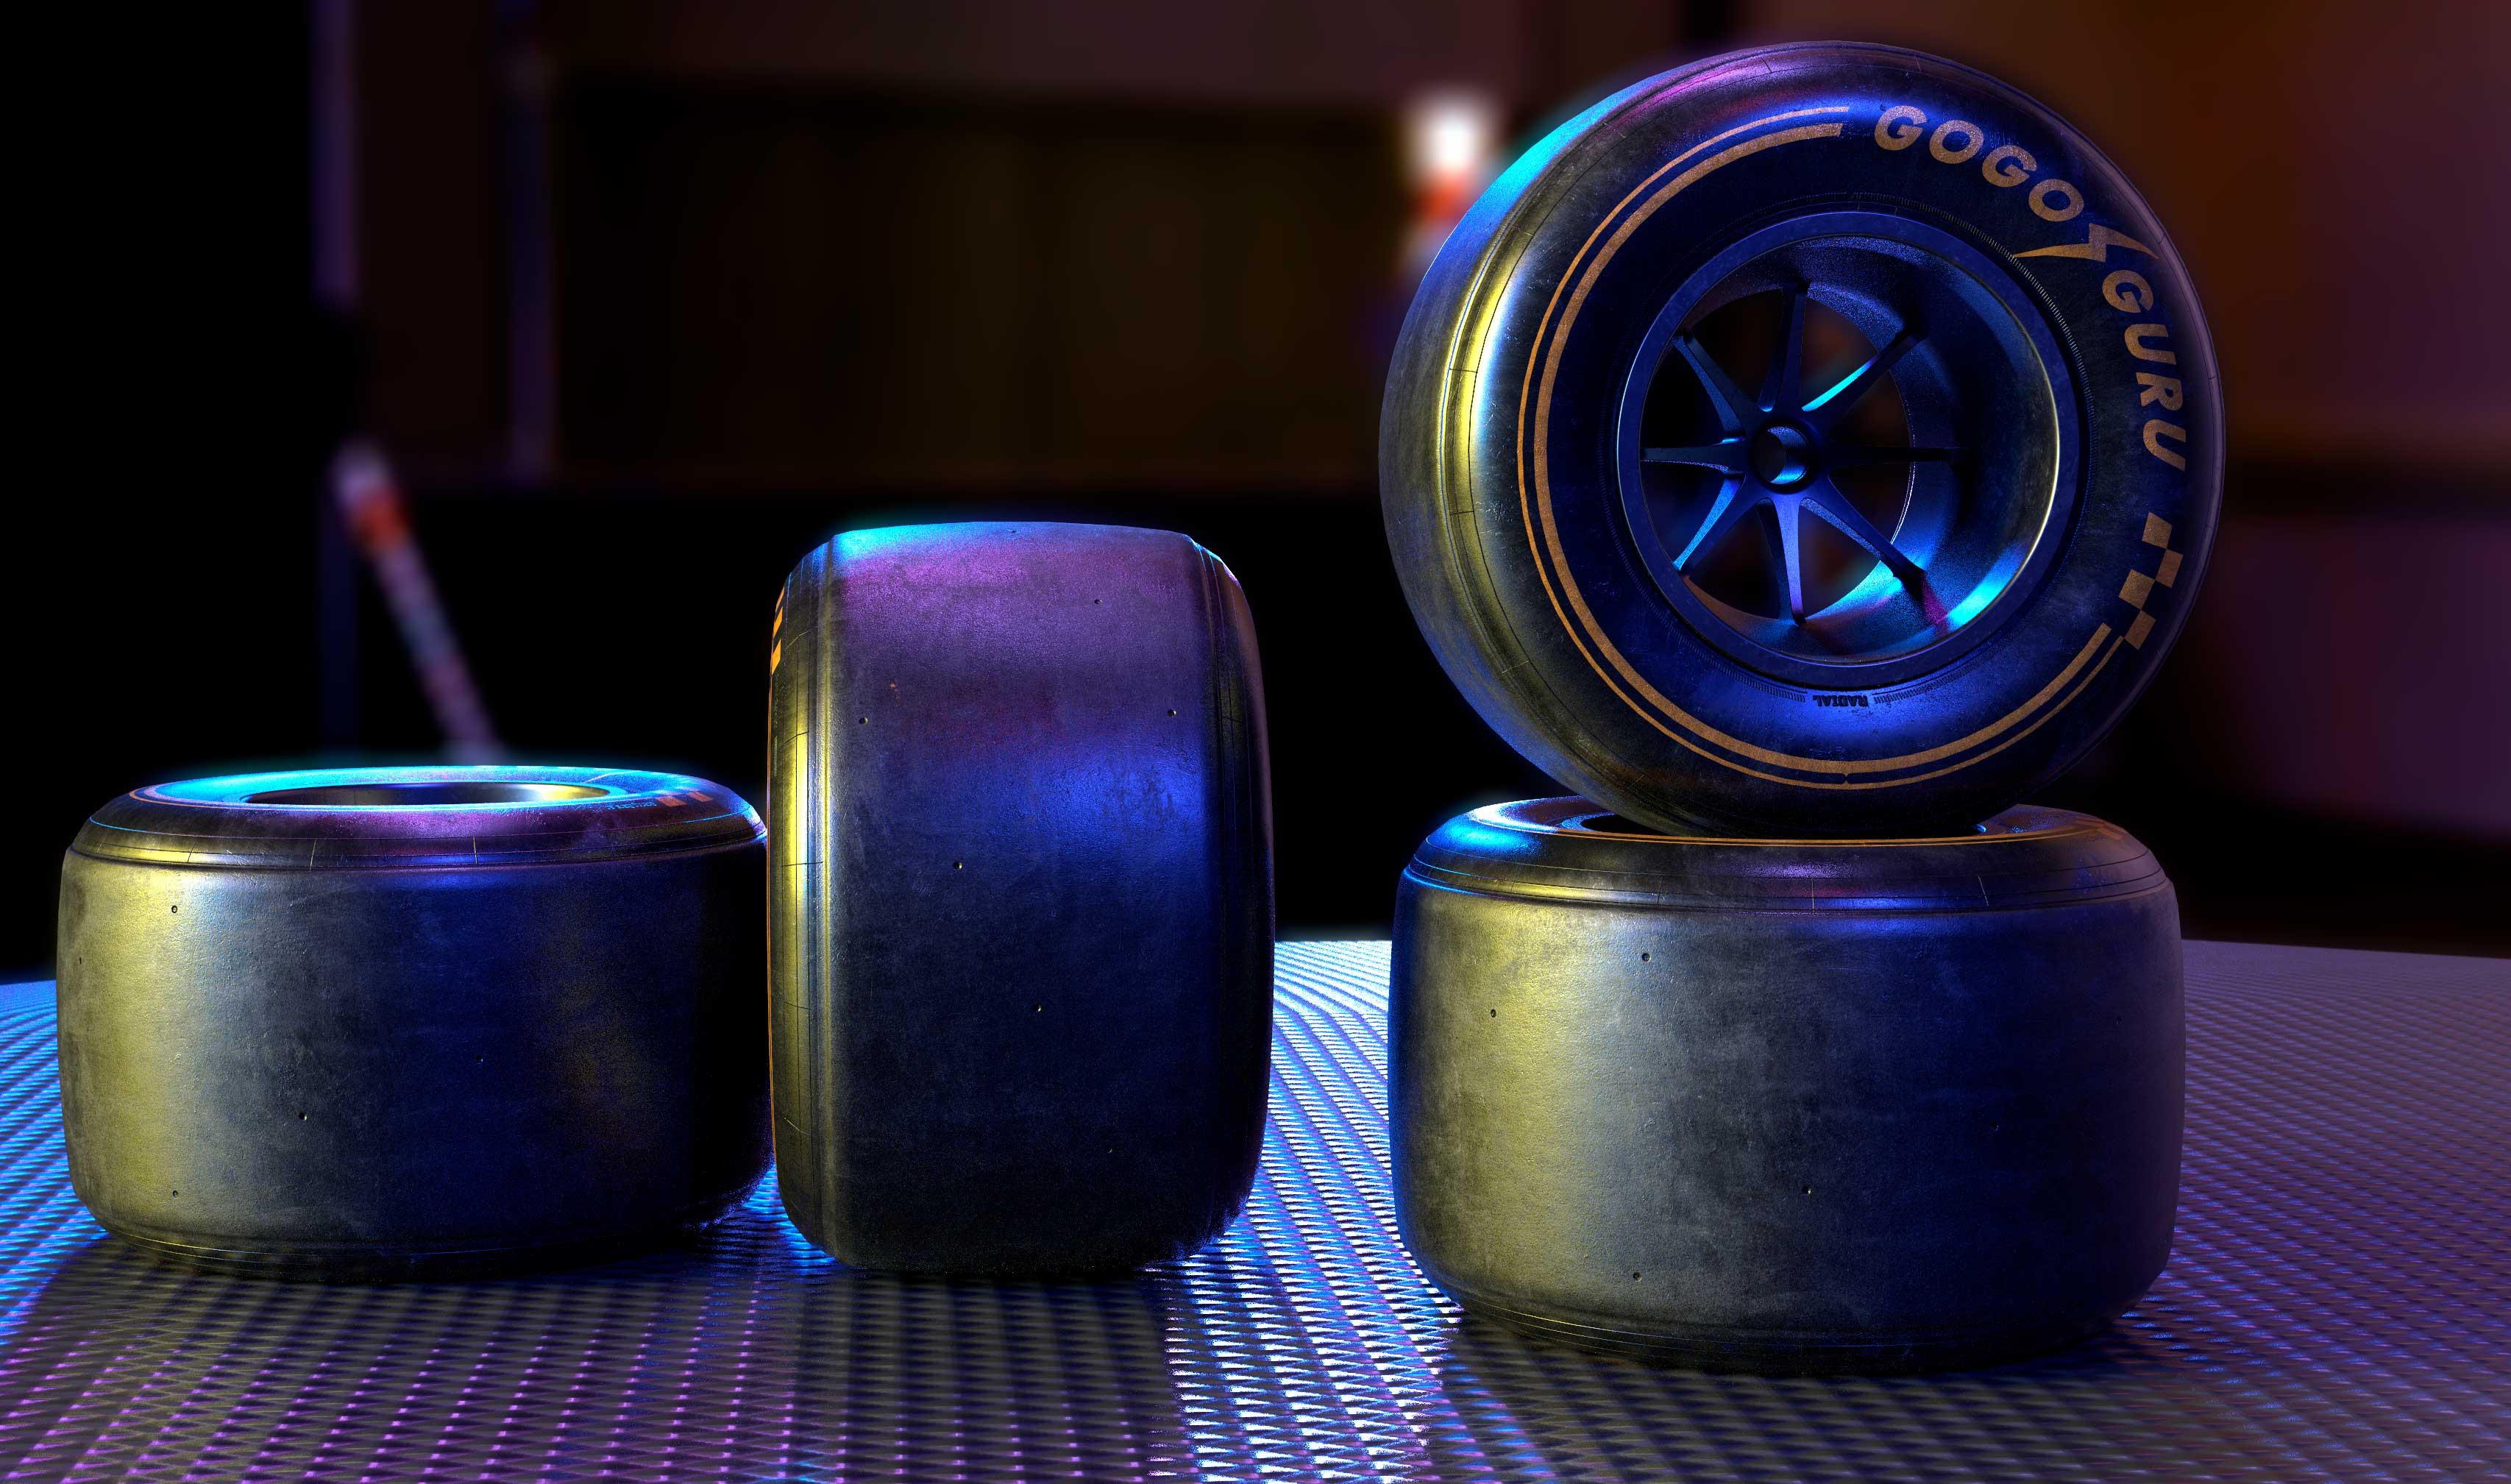 GOGO GURU 2019 F1 rear tiers made by Alan Mattano at SoaringStars lab